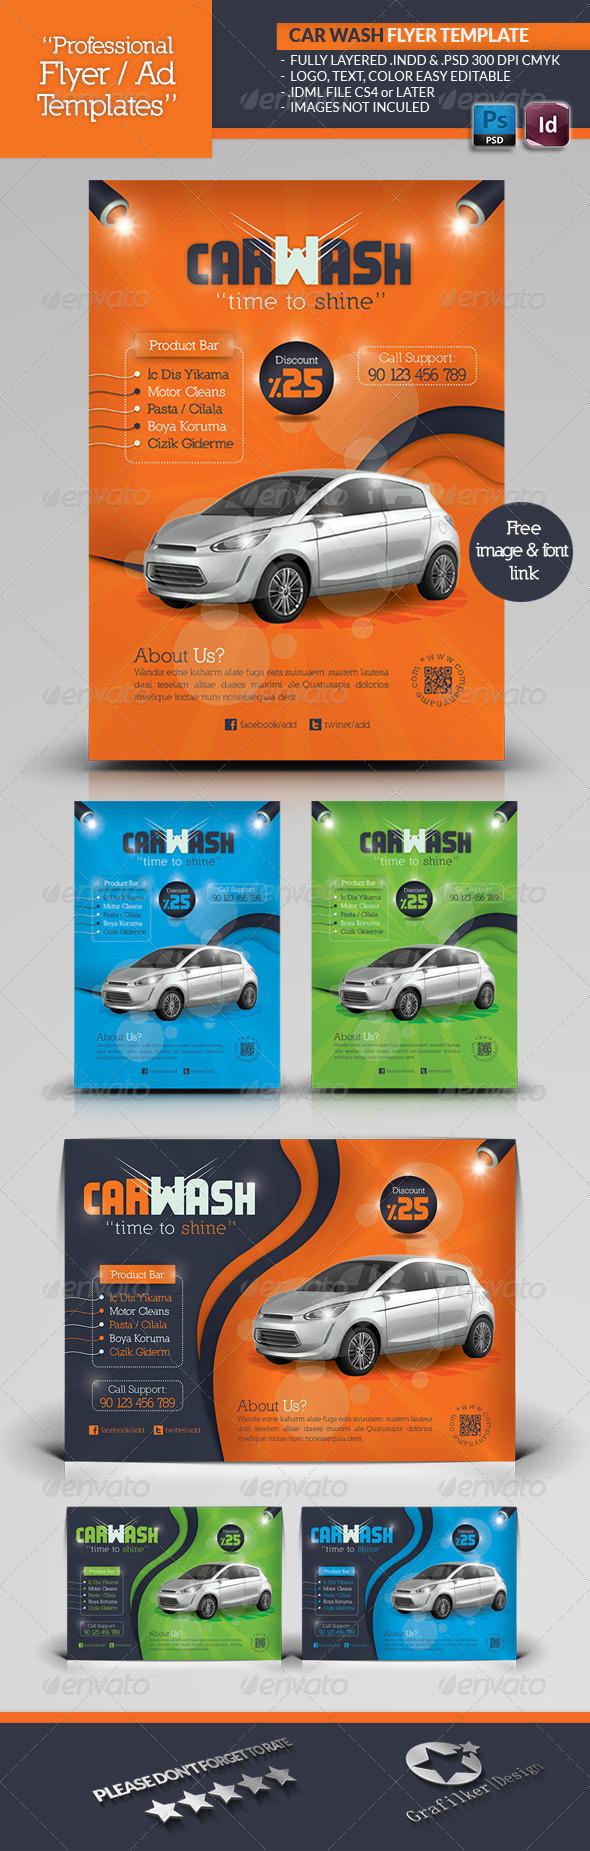 Car Wash Flyer Template  Car Flyer Template